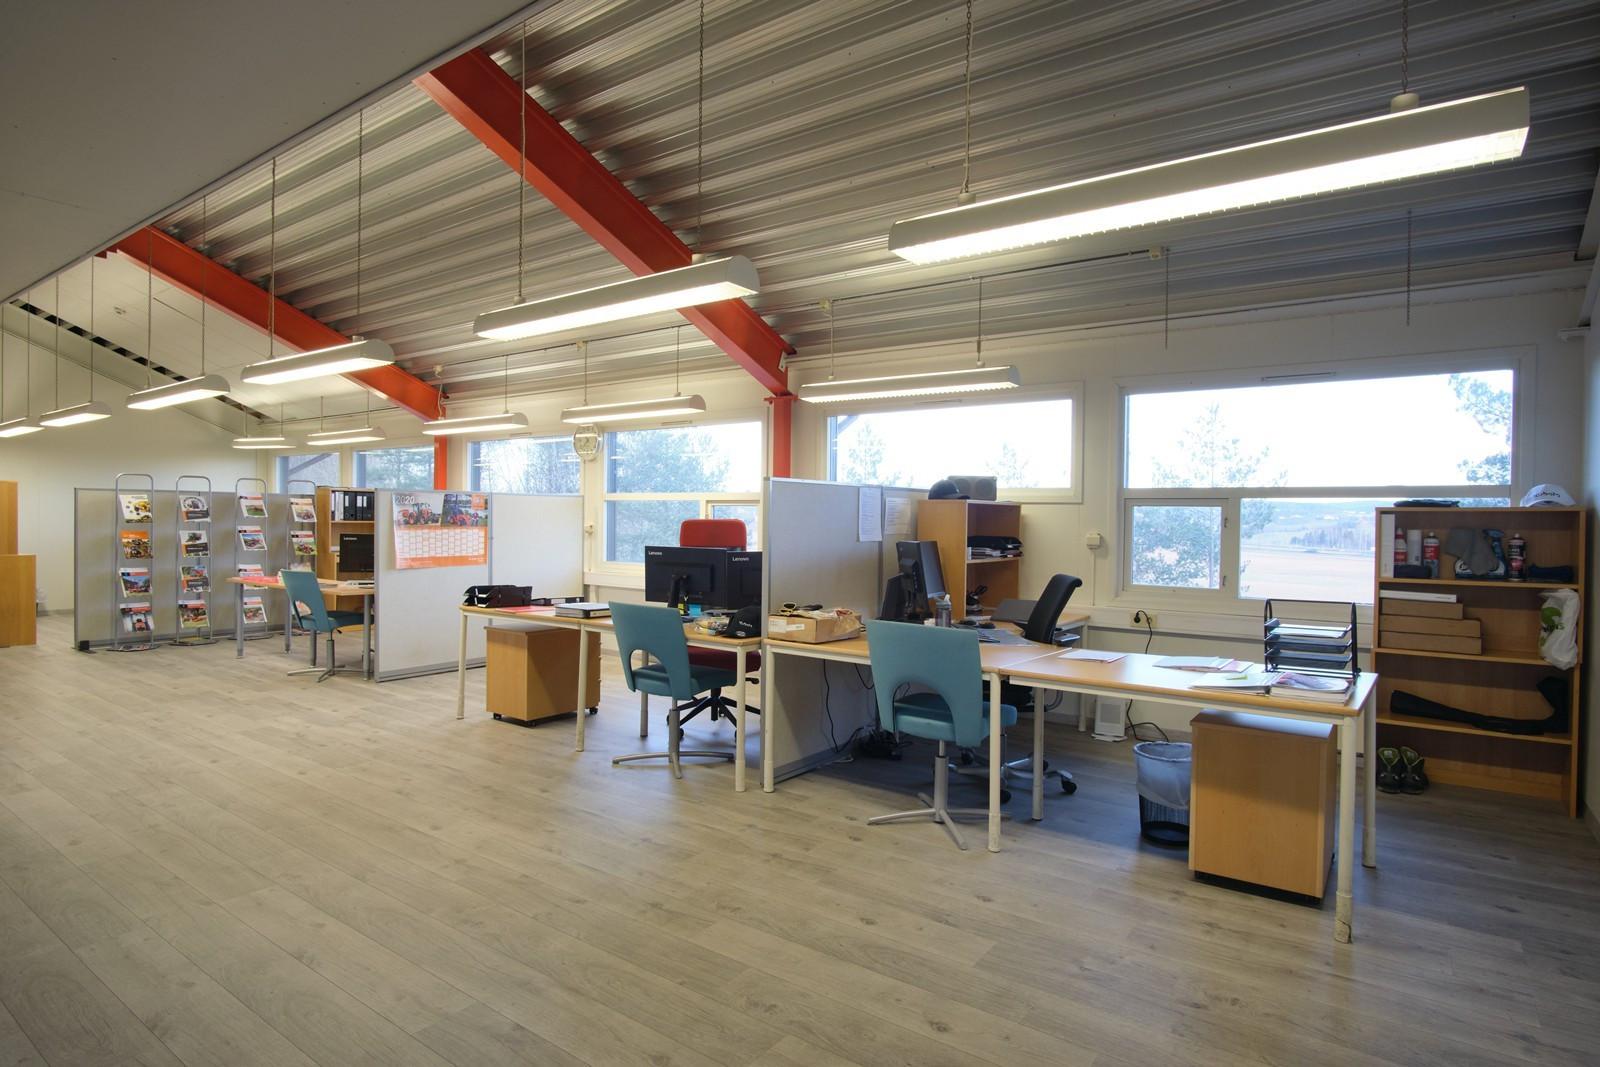 Kontor i åpent landskap med store vindusflater